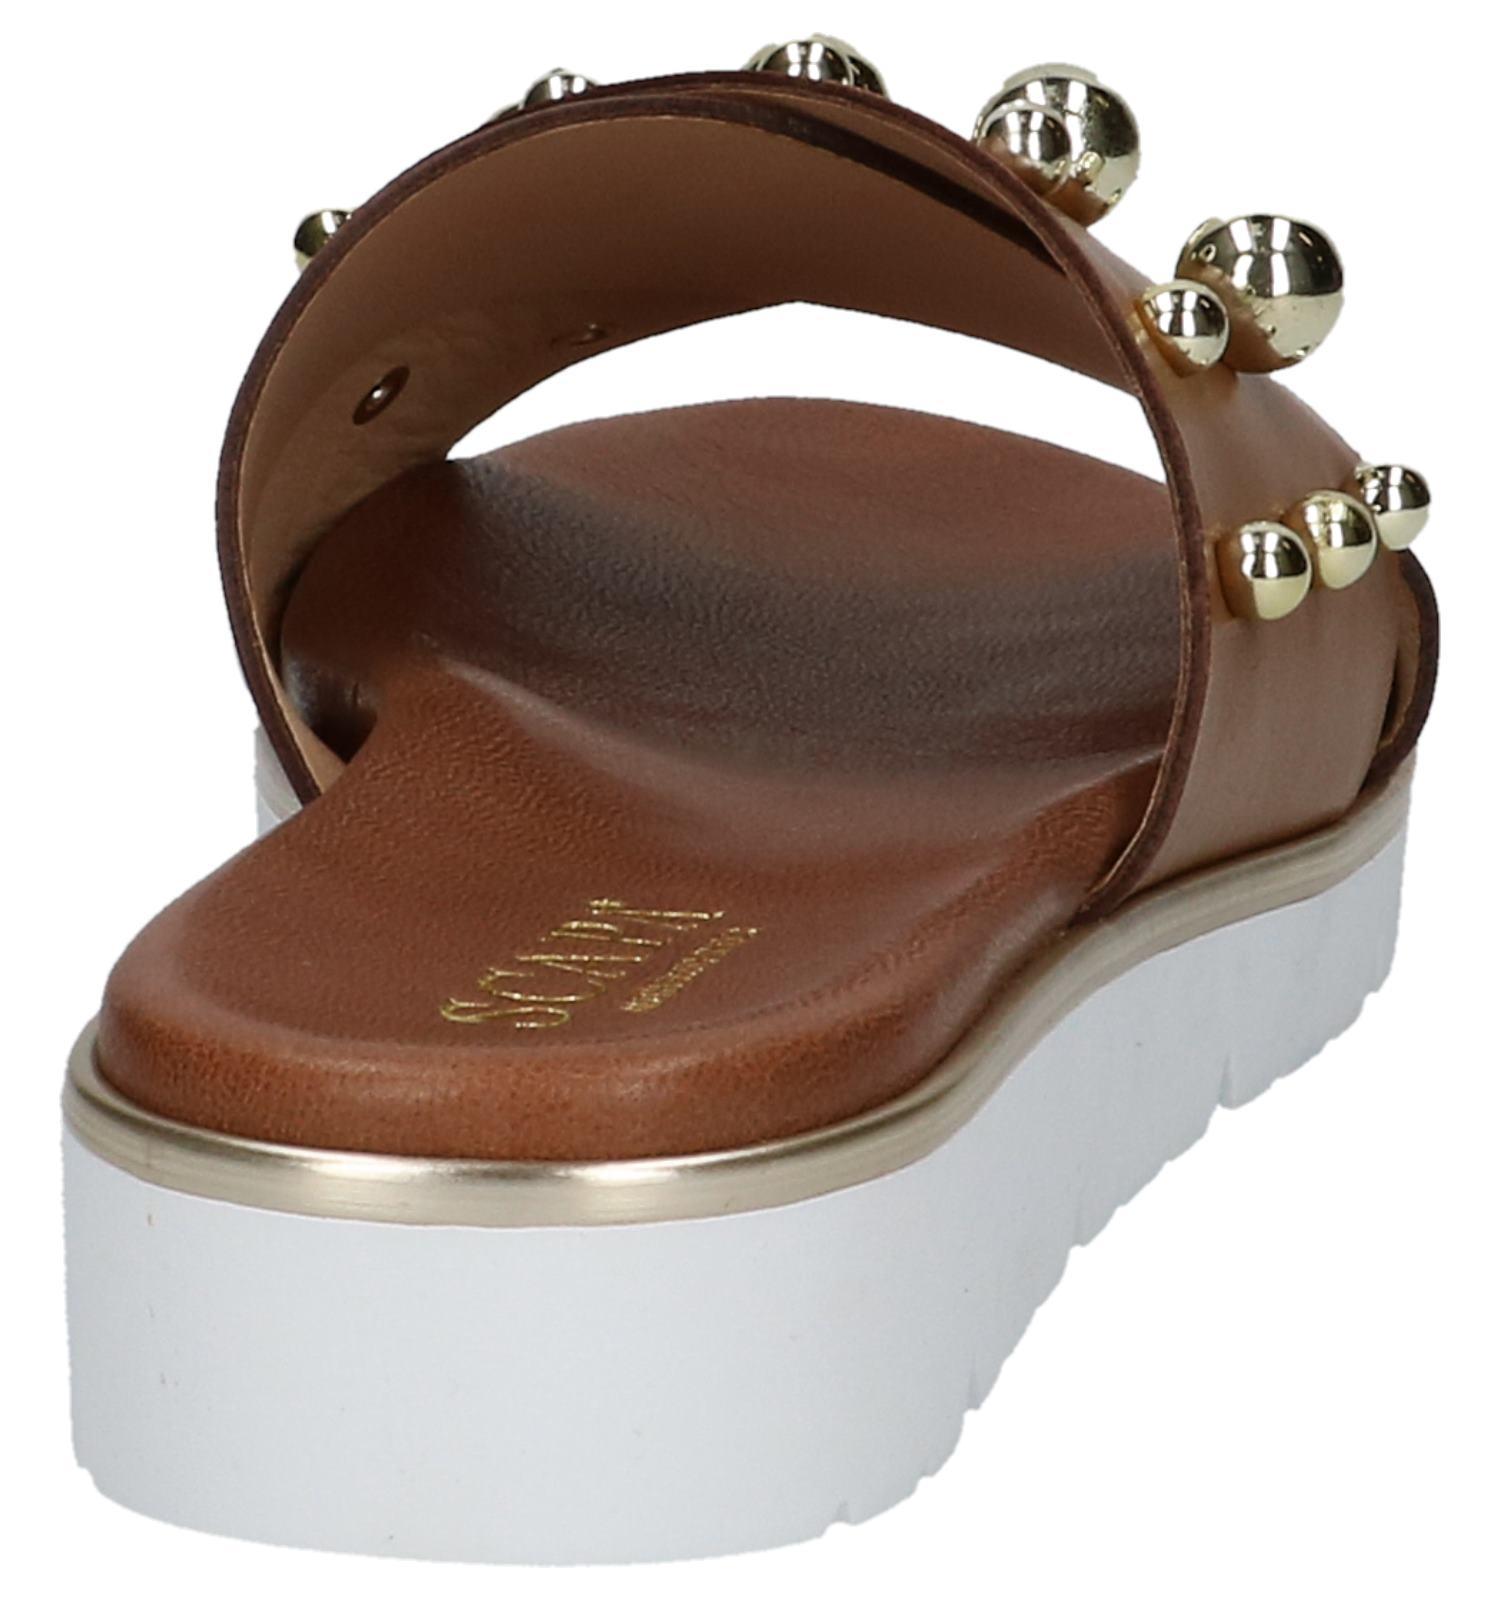 Scapa Scapa Slippers Cognac Cognac Slippers Scapa Elegante Slippers Elegante Cognac Elegante yvN80PmnwO